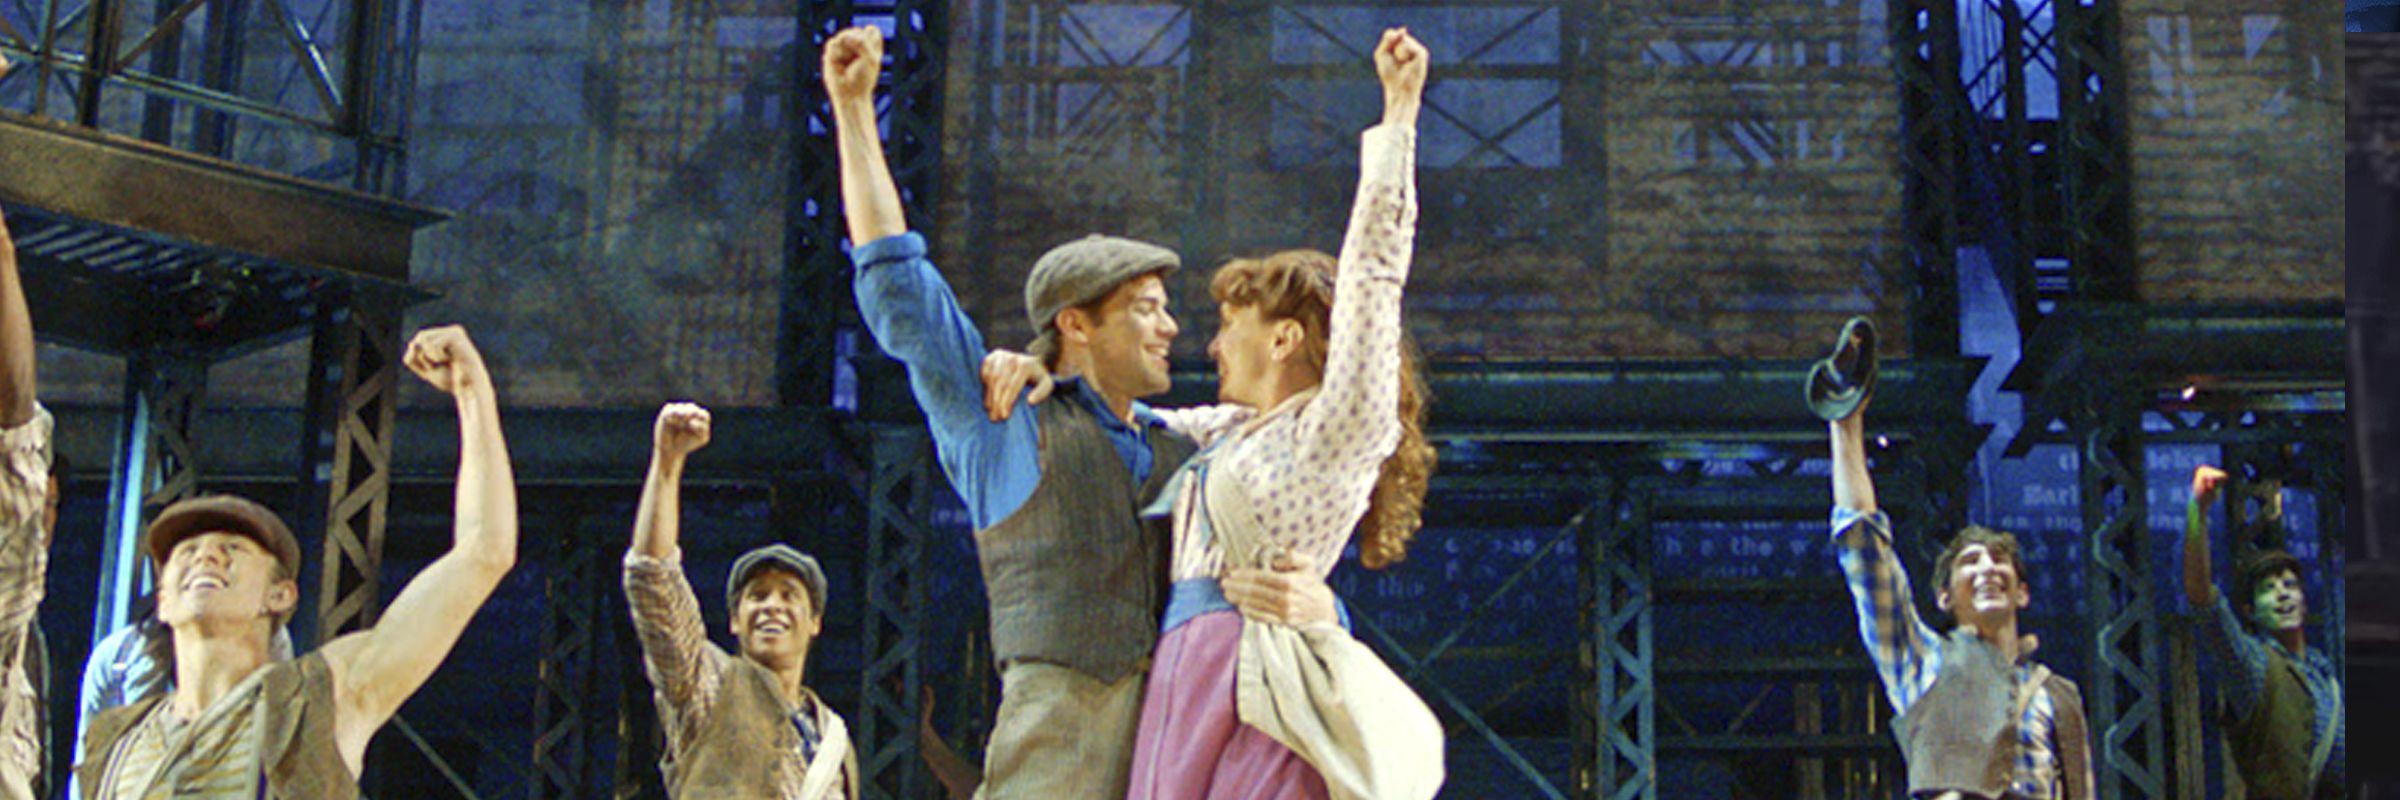 Newsies: The Broadway Musical   Full Movie   Movies Anywhere